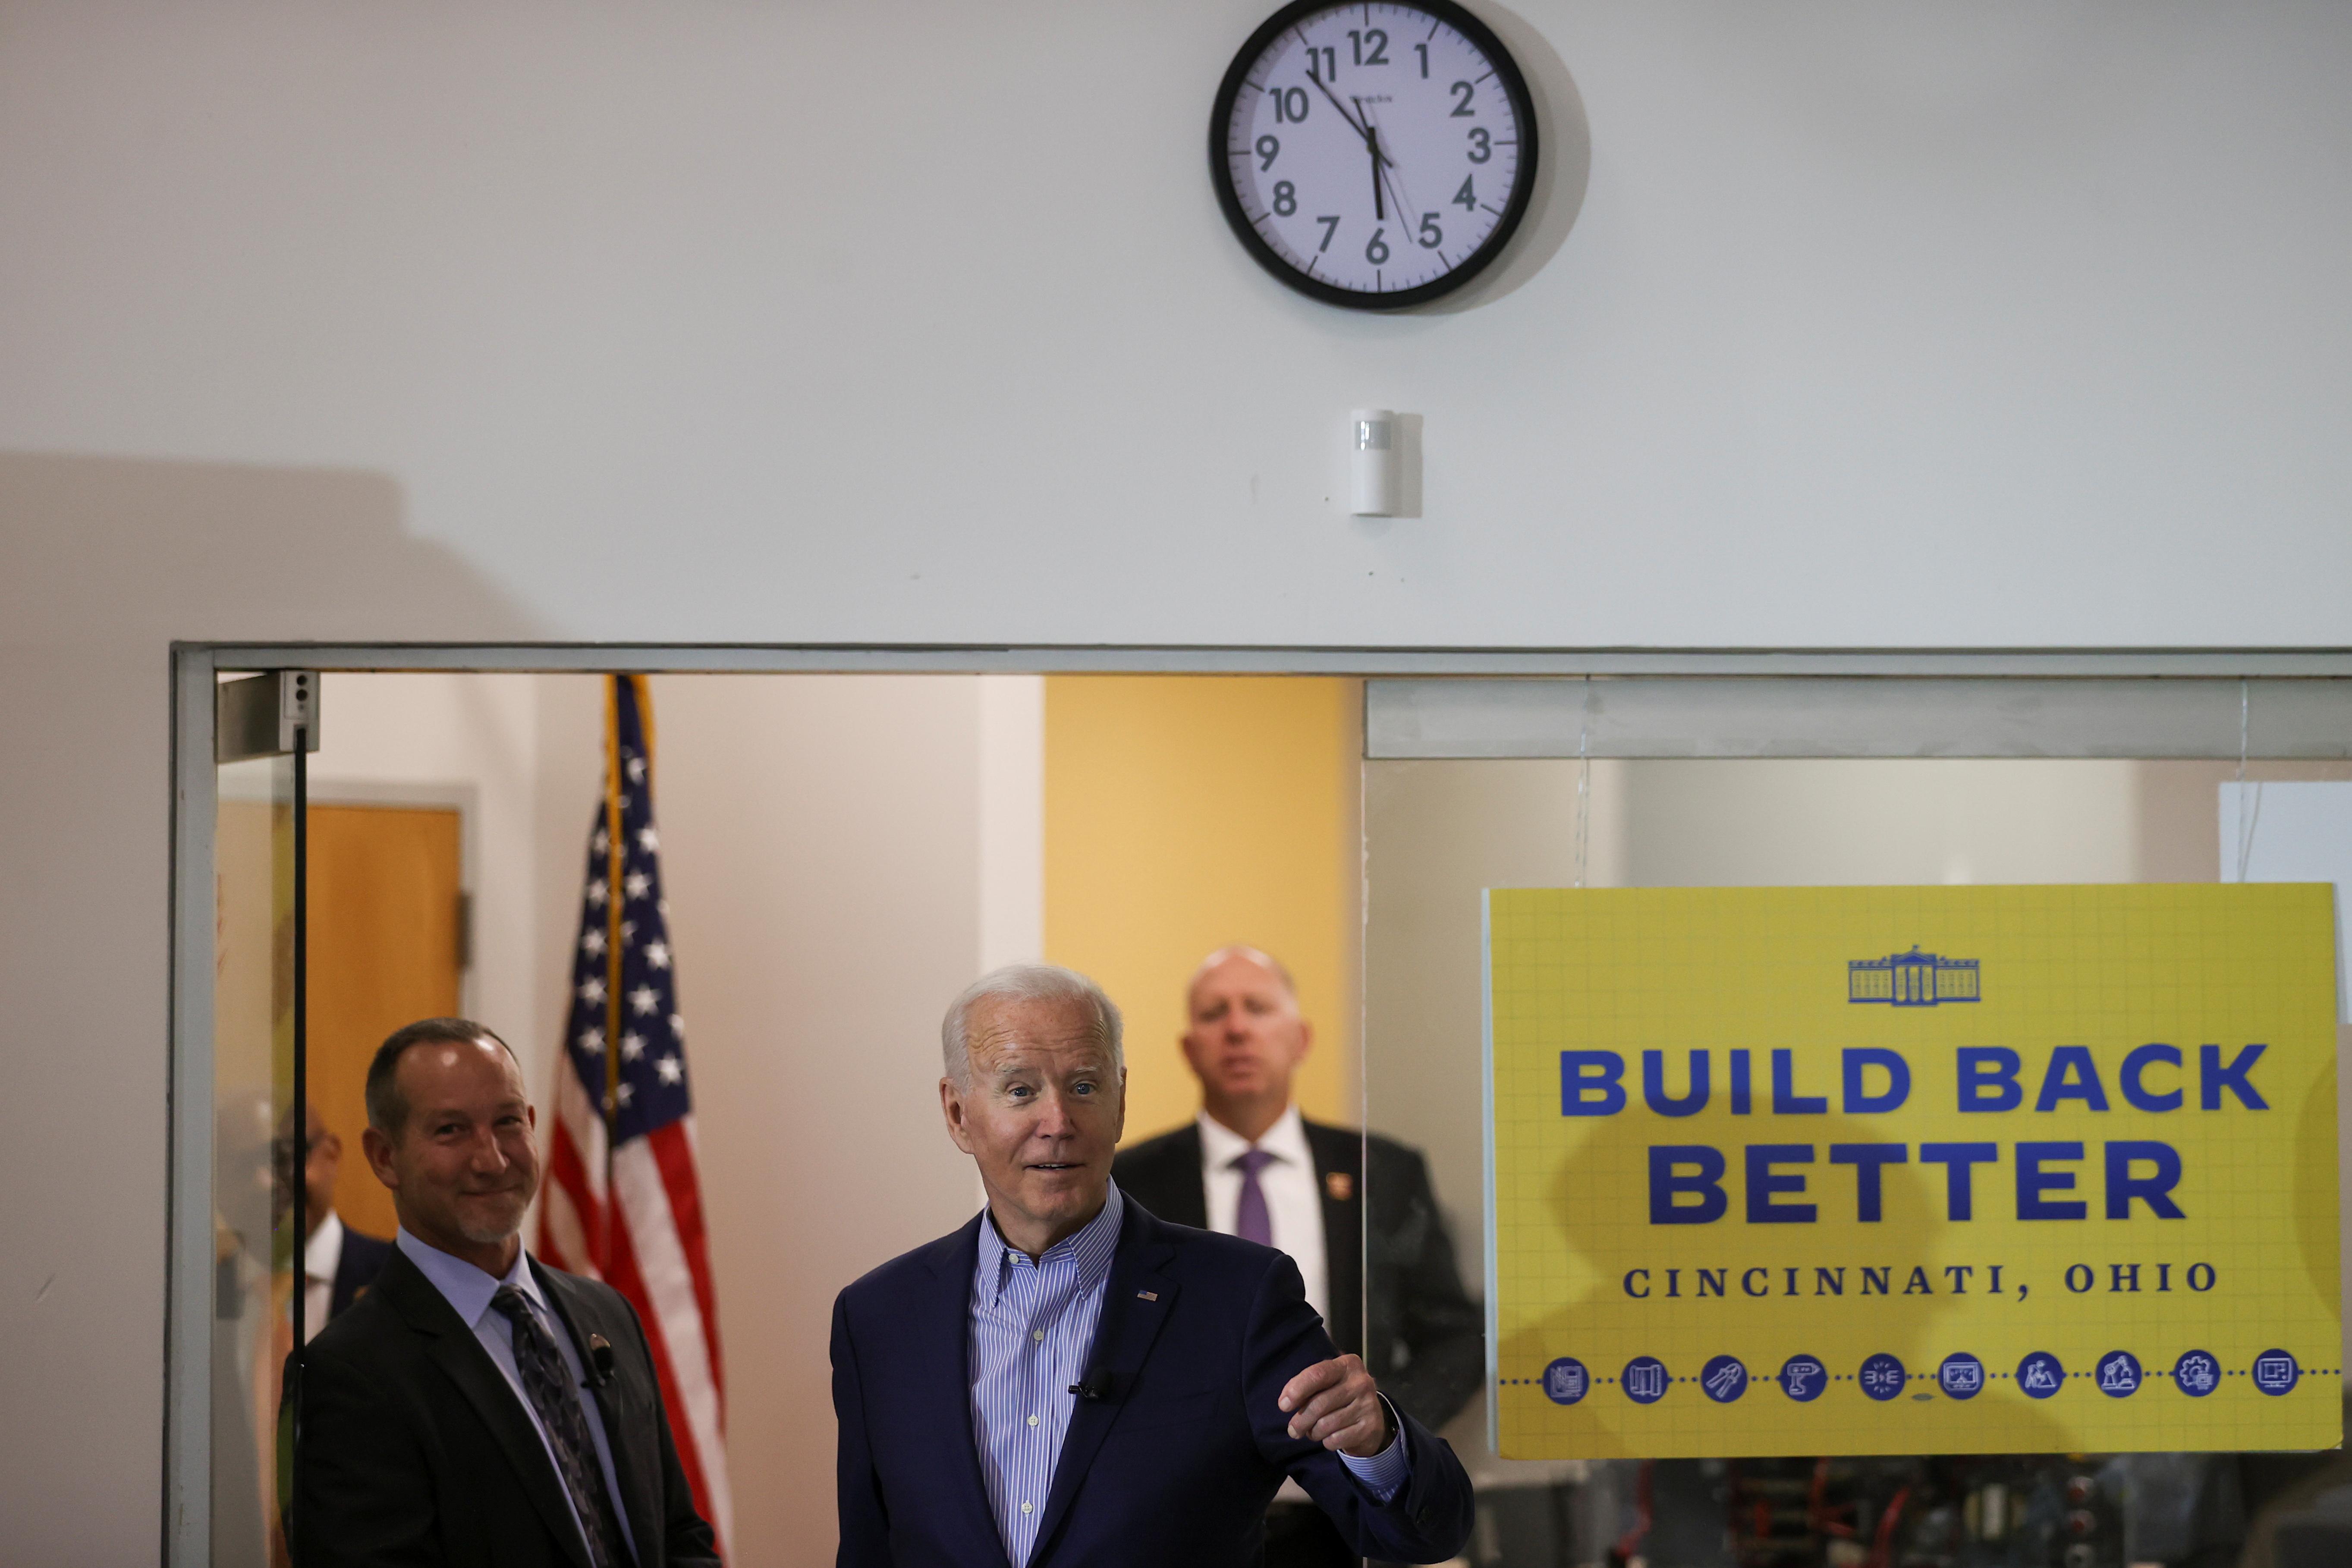 U.S. President Joe Biden visits IBEW/NECA union electrician training center in Cincinnati, Ohio, U.S., July 21, 2021. REUTERS/Jonathan Ernst